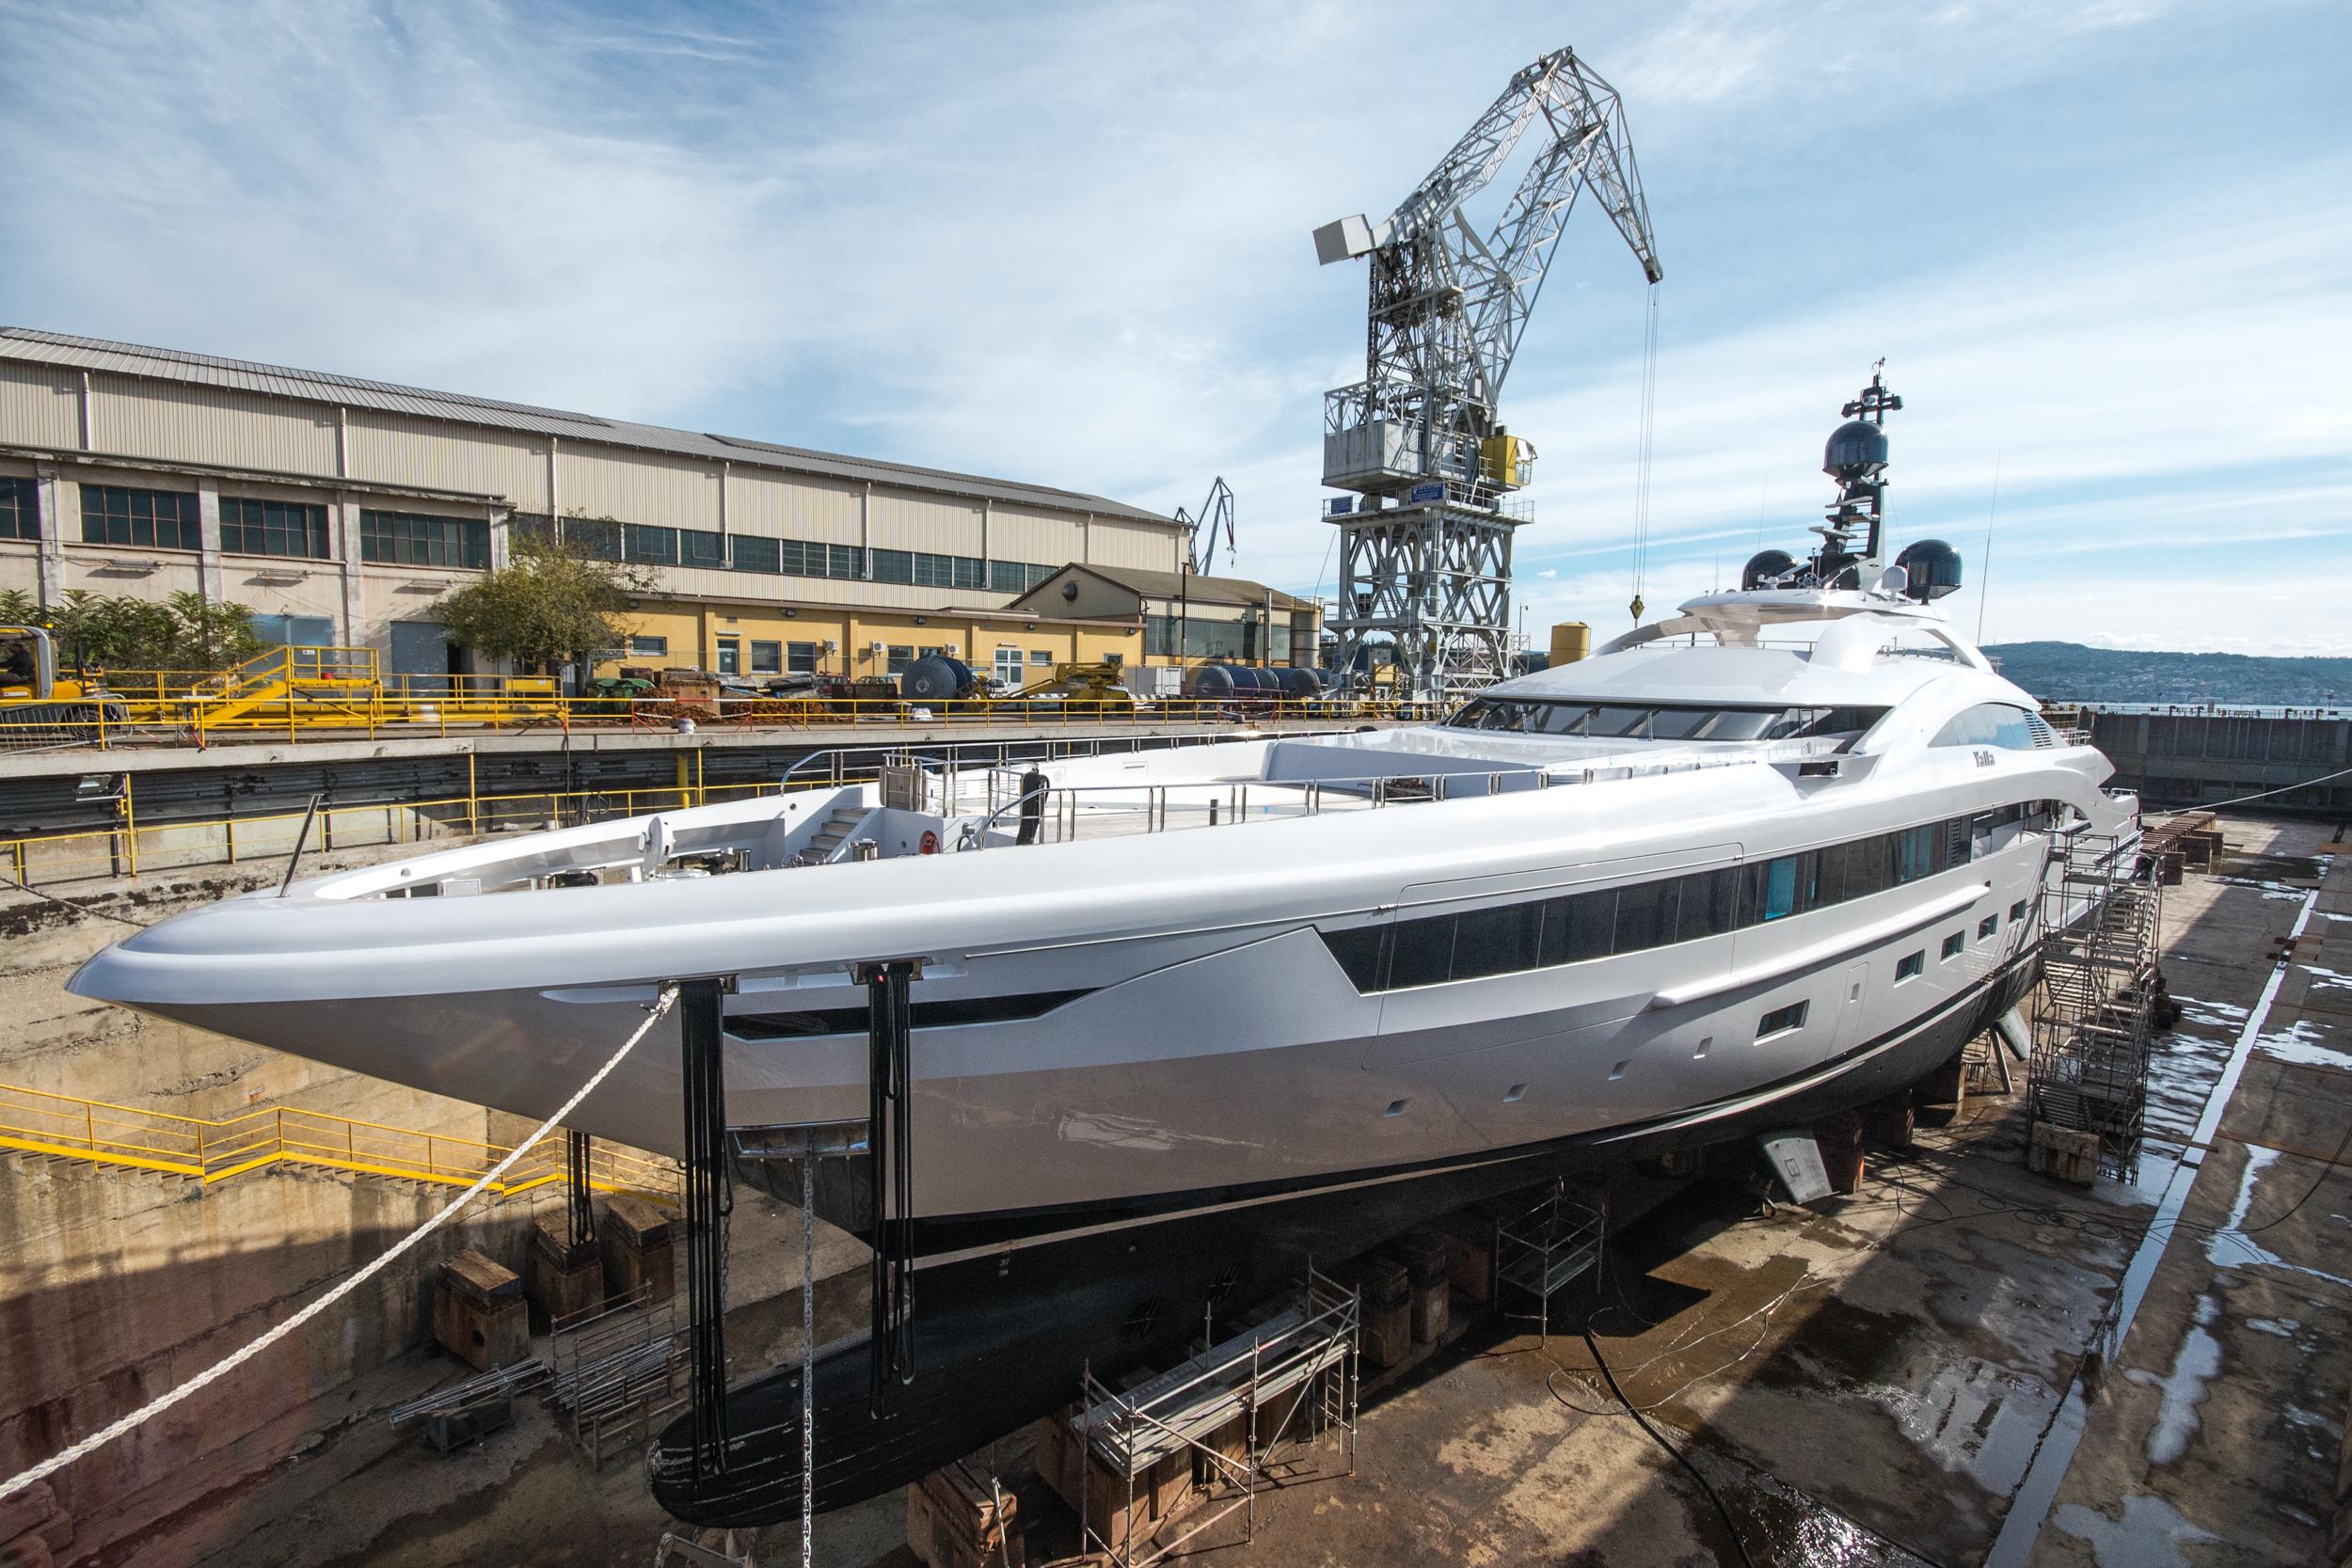 Cartubi and Trieste Yacht Service @ MYBA 2017